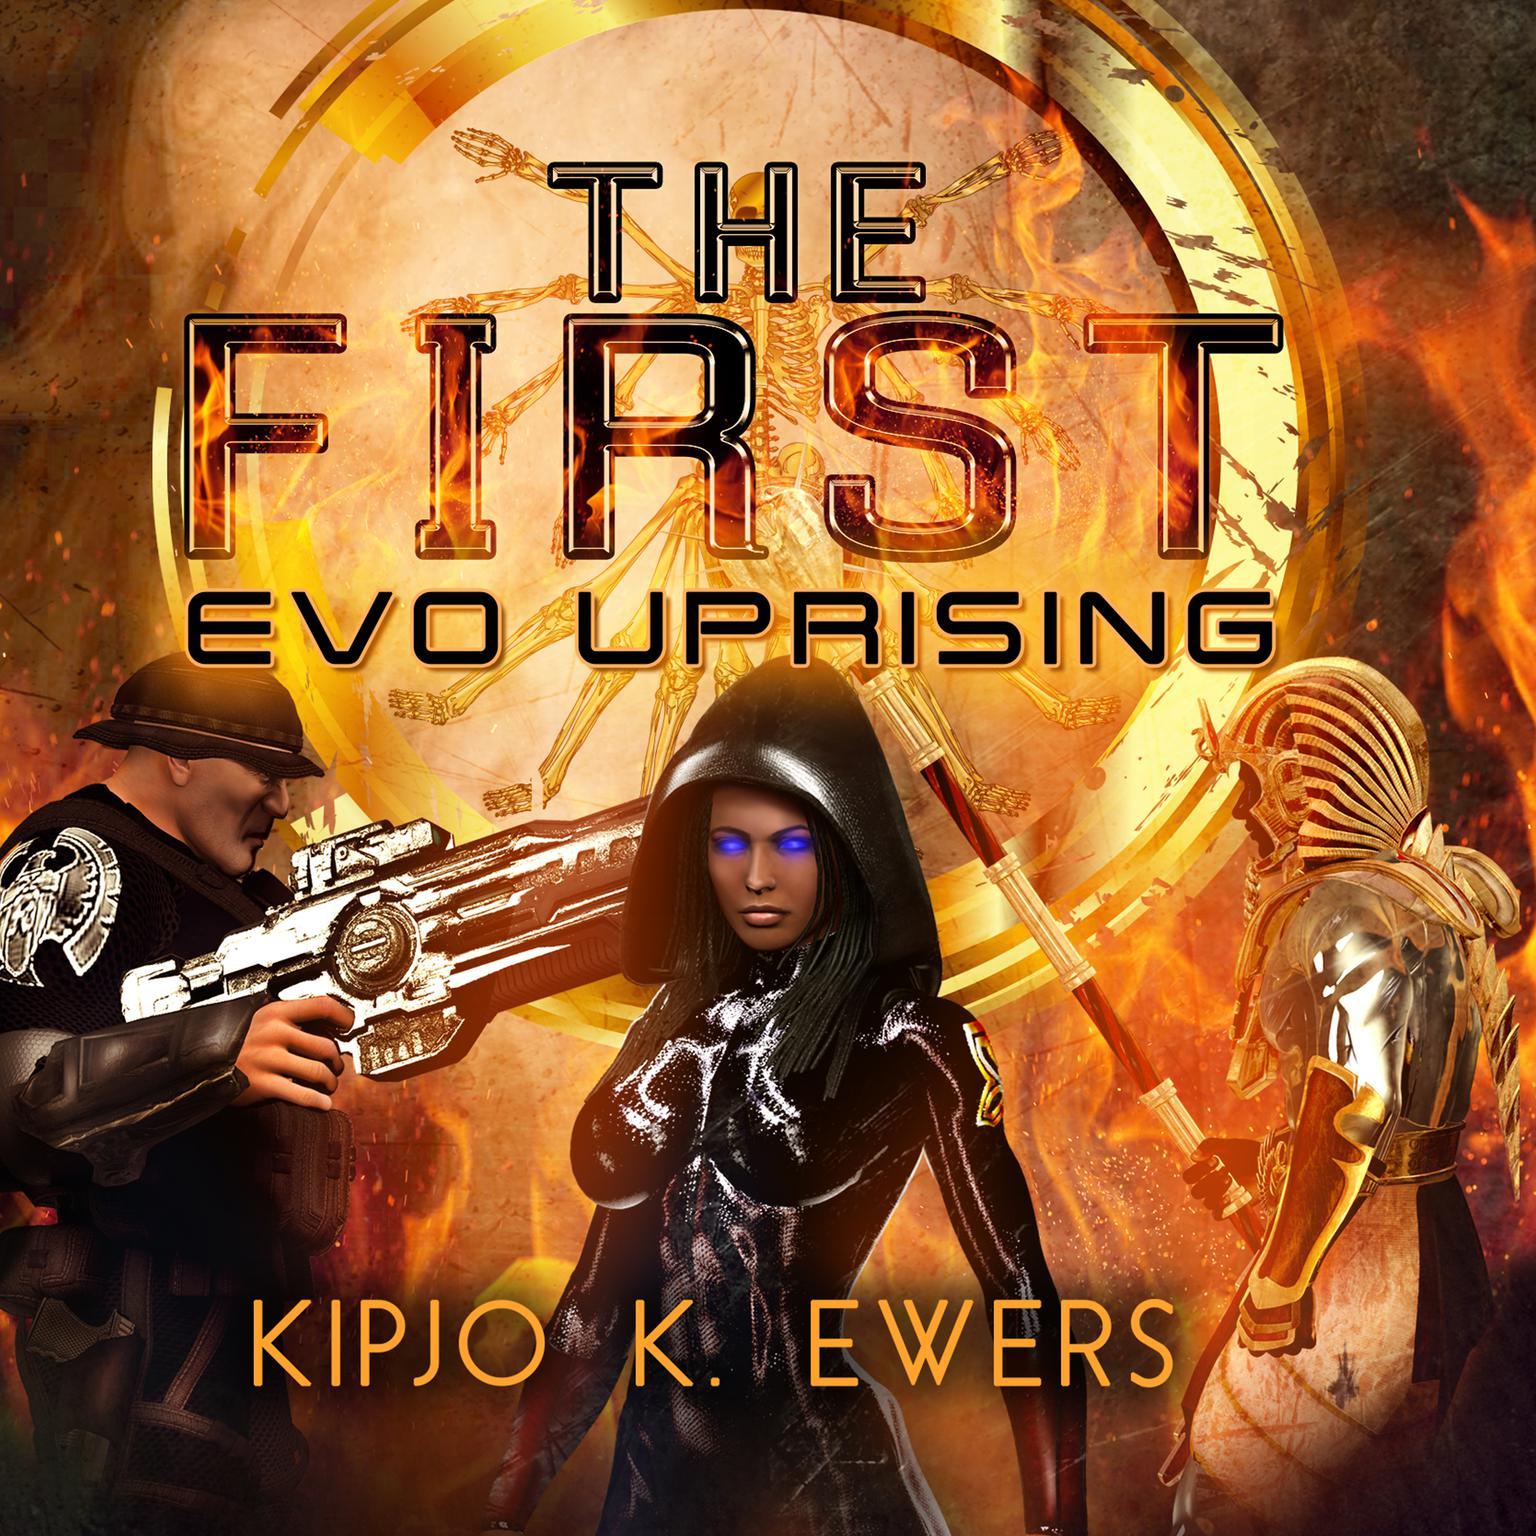 EVO Uprising Audiobook, by Kipjo K. Ewers